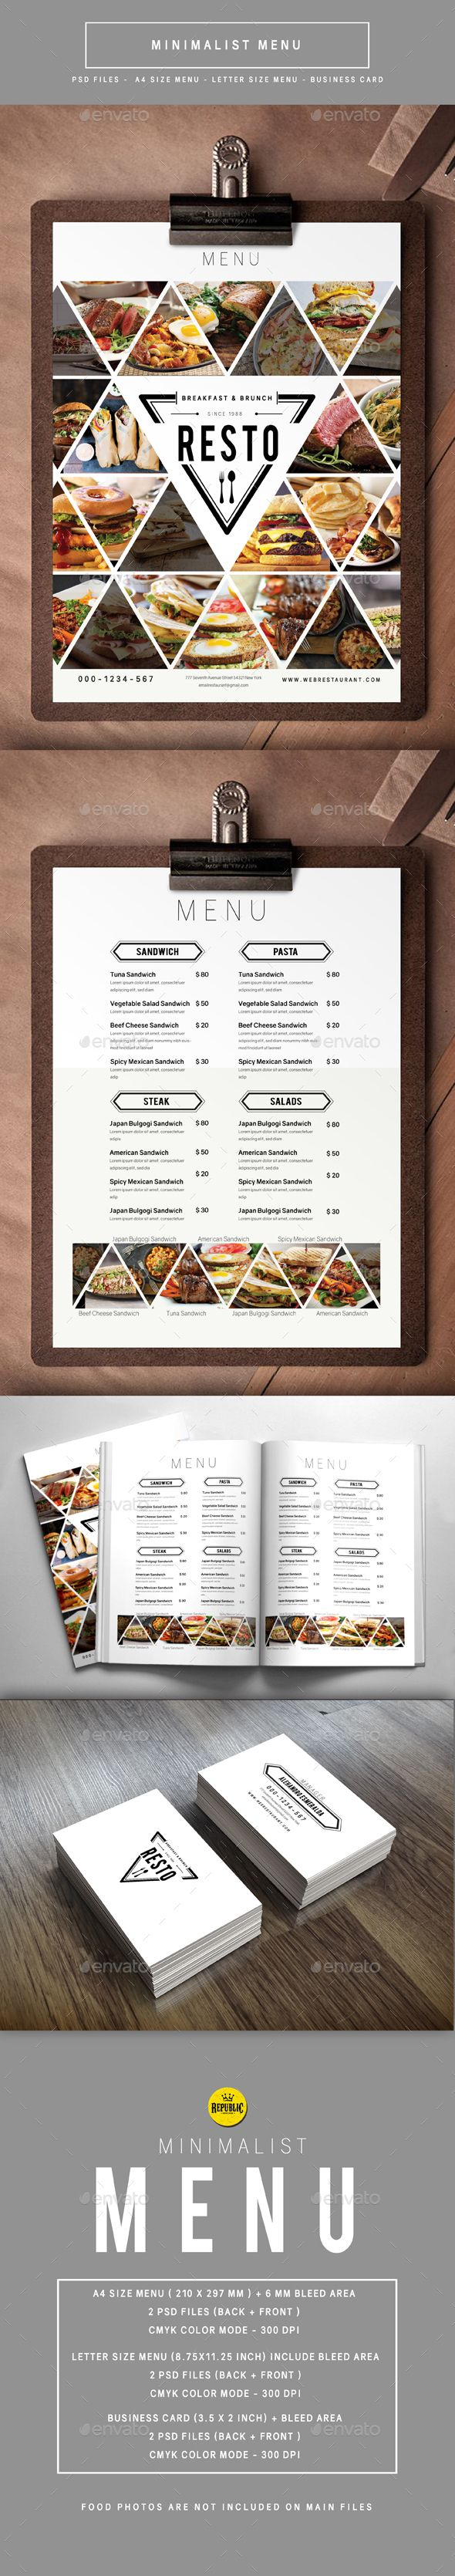 Minimalist Menu — Photoshop PSD #restaurant #bistro • Available here → https://graphicriver.net/item/minimalist-menu/16461198?ref=pxcr